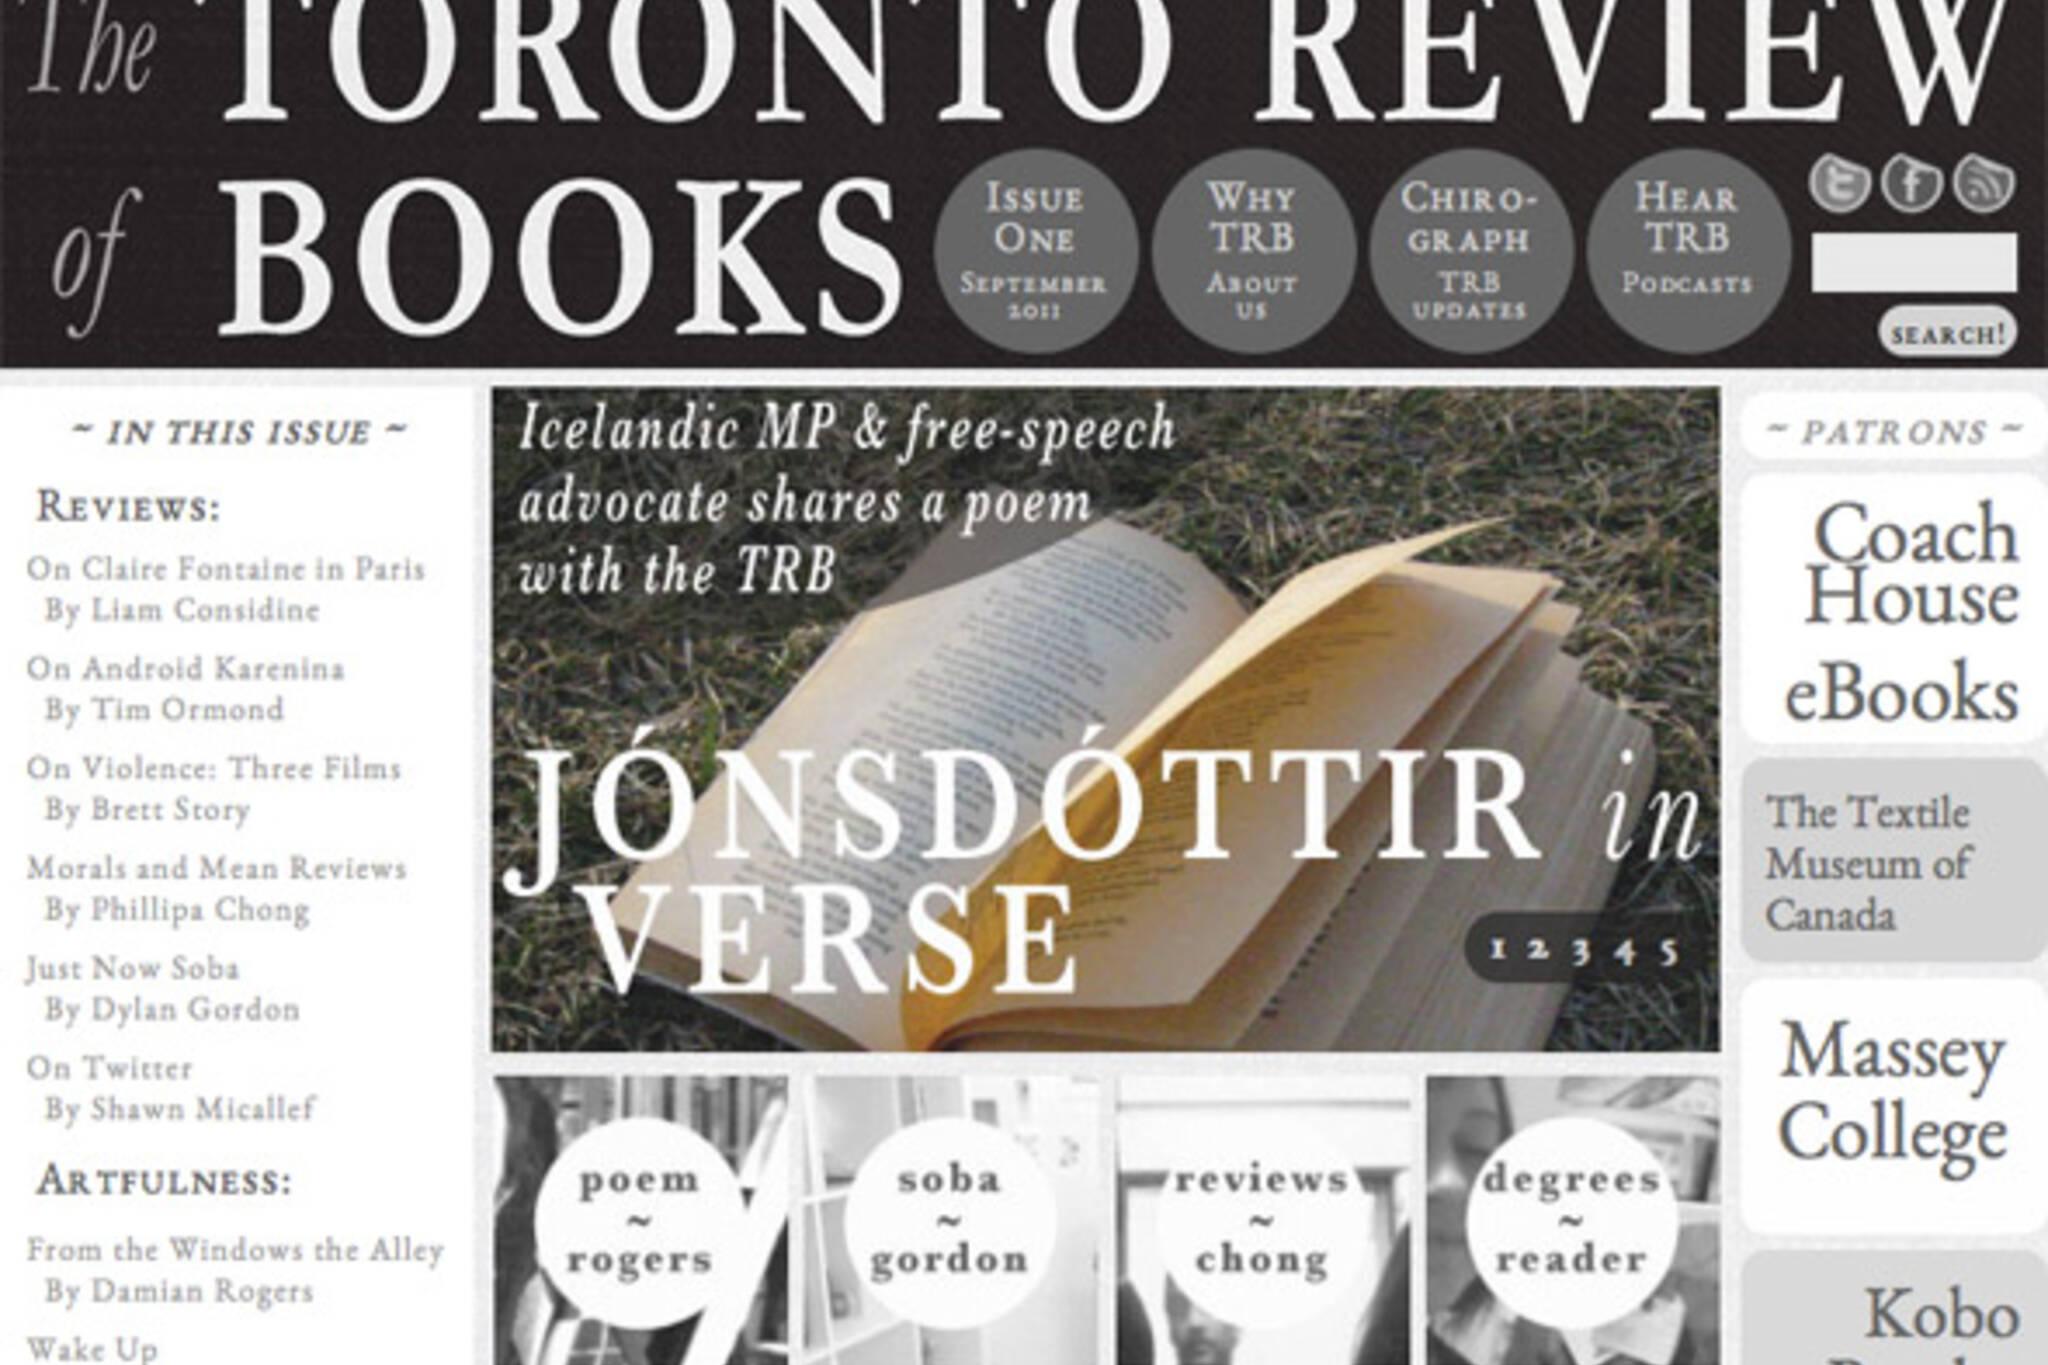 Toronto Review of Books